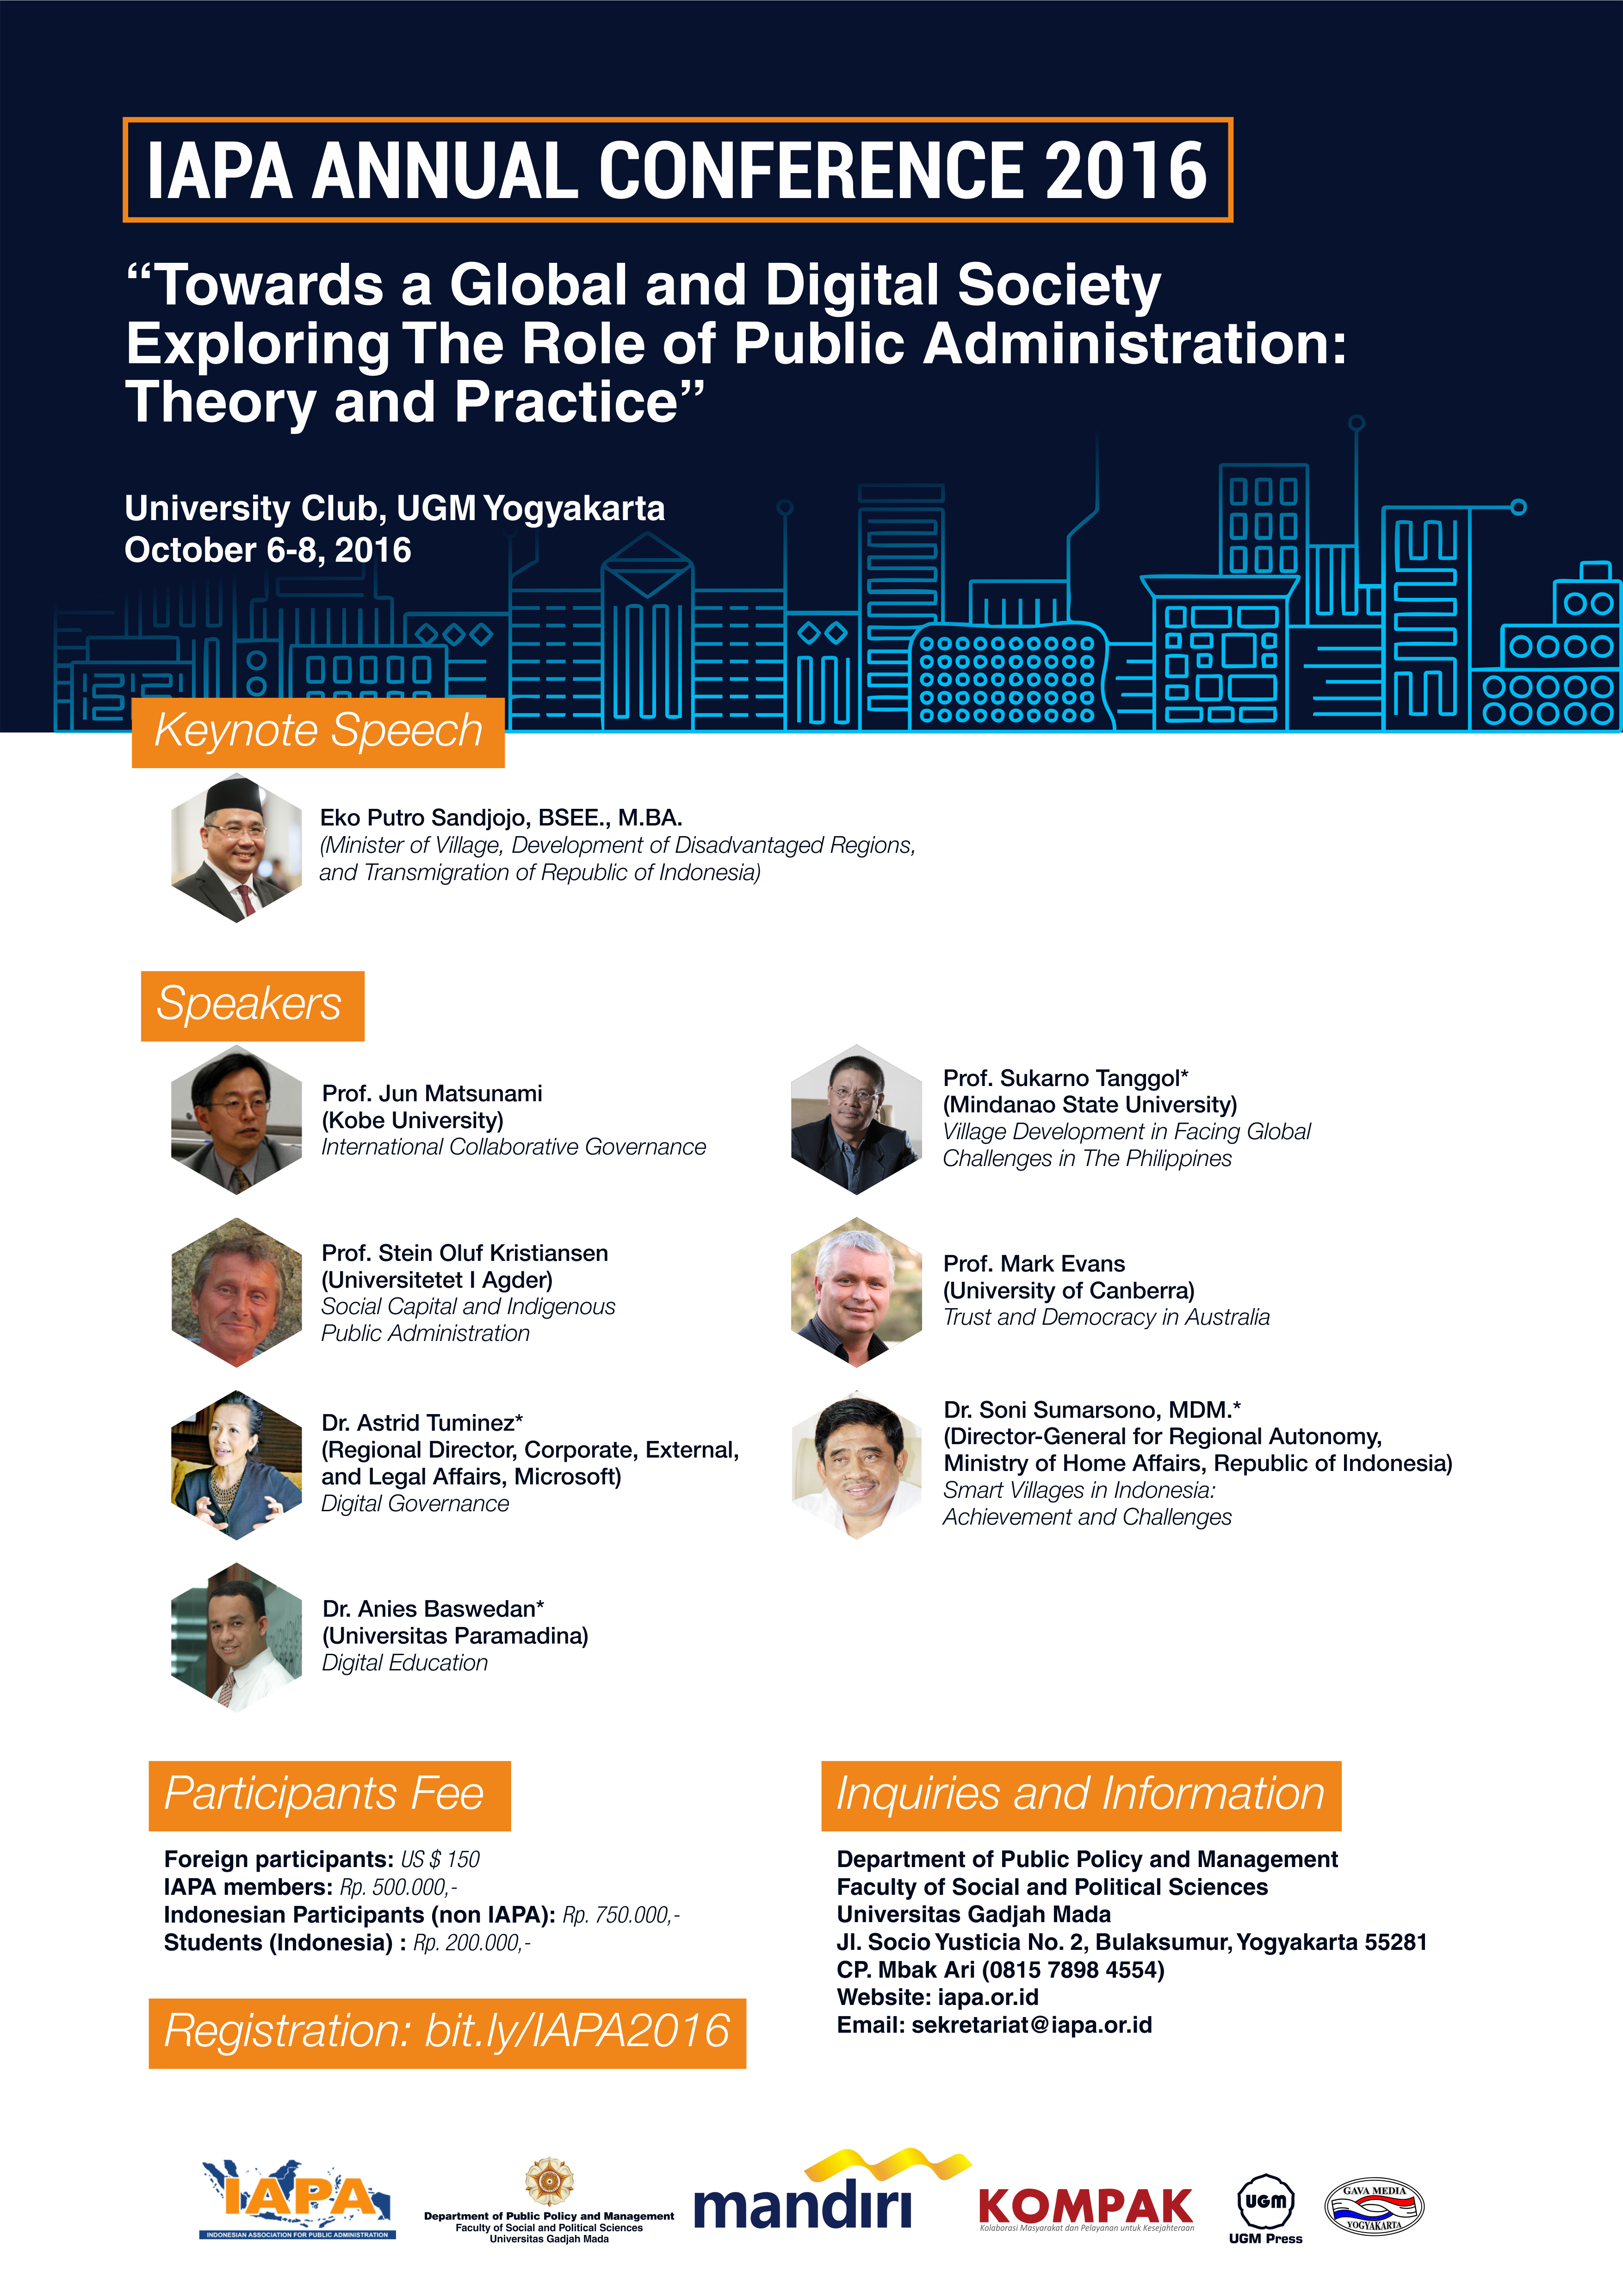 IAPA Conference Poster